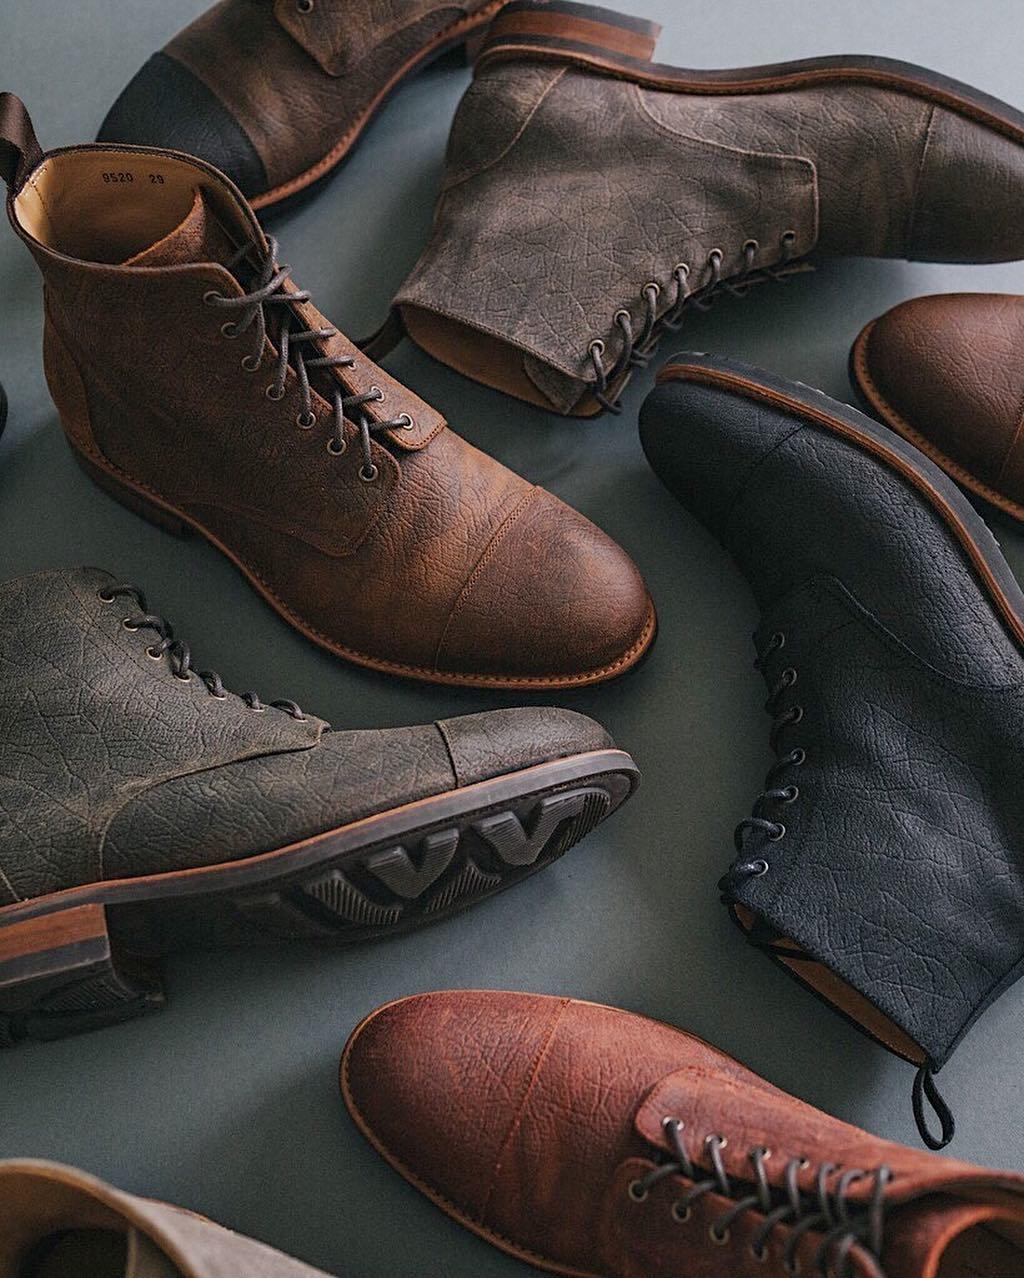 taft dragon boots.jpg